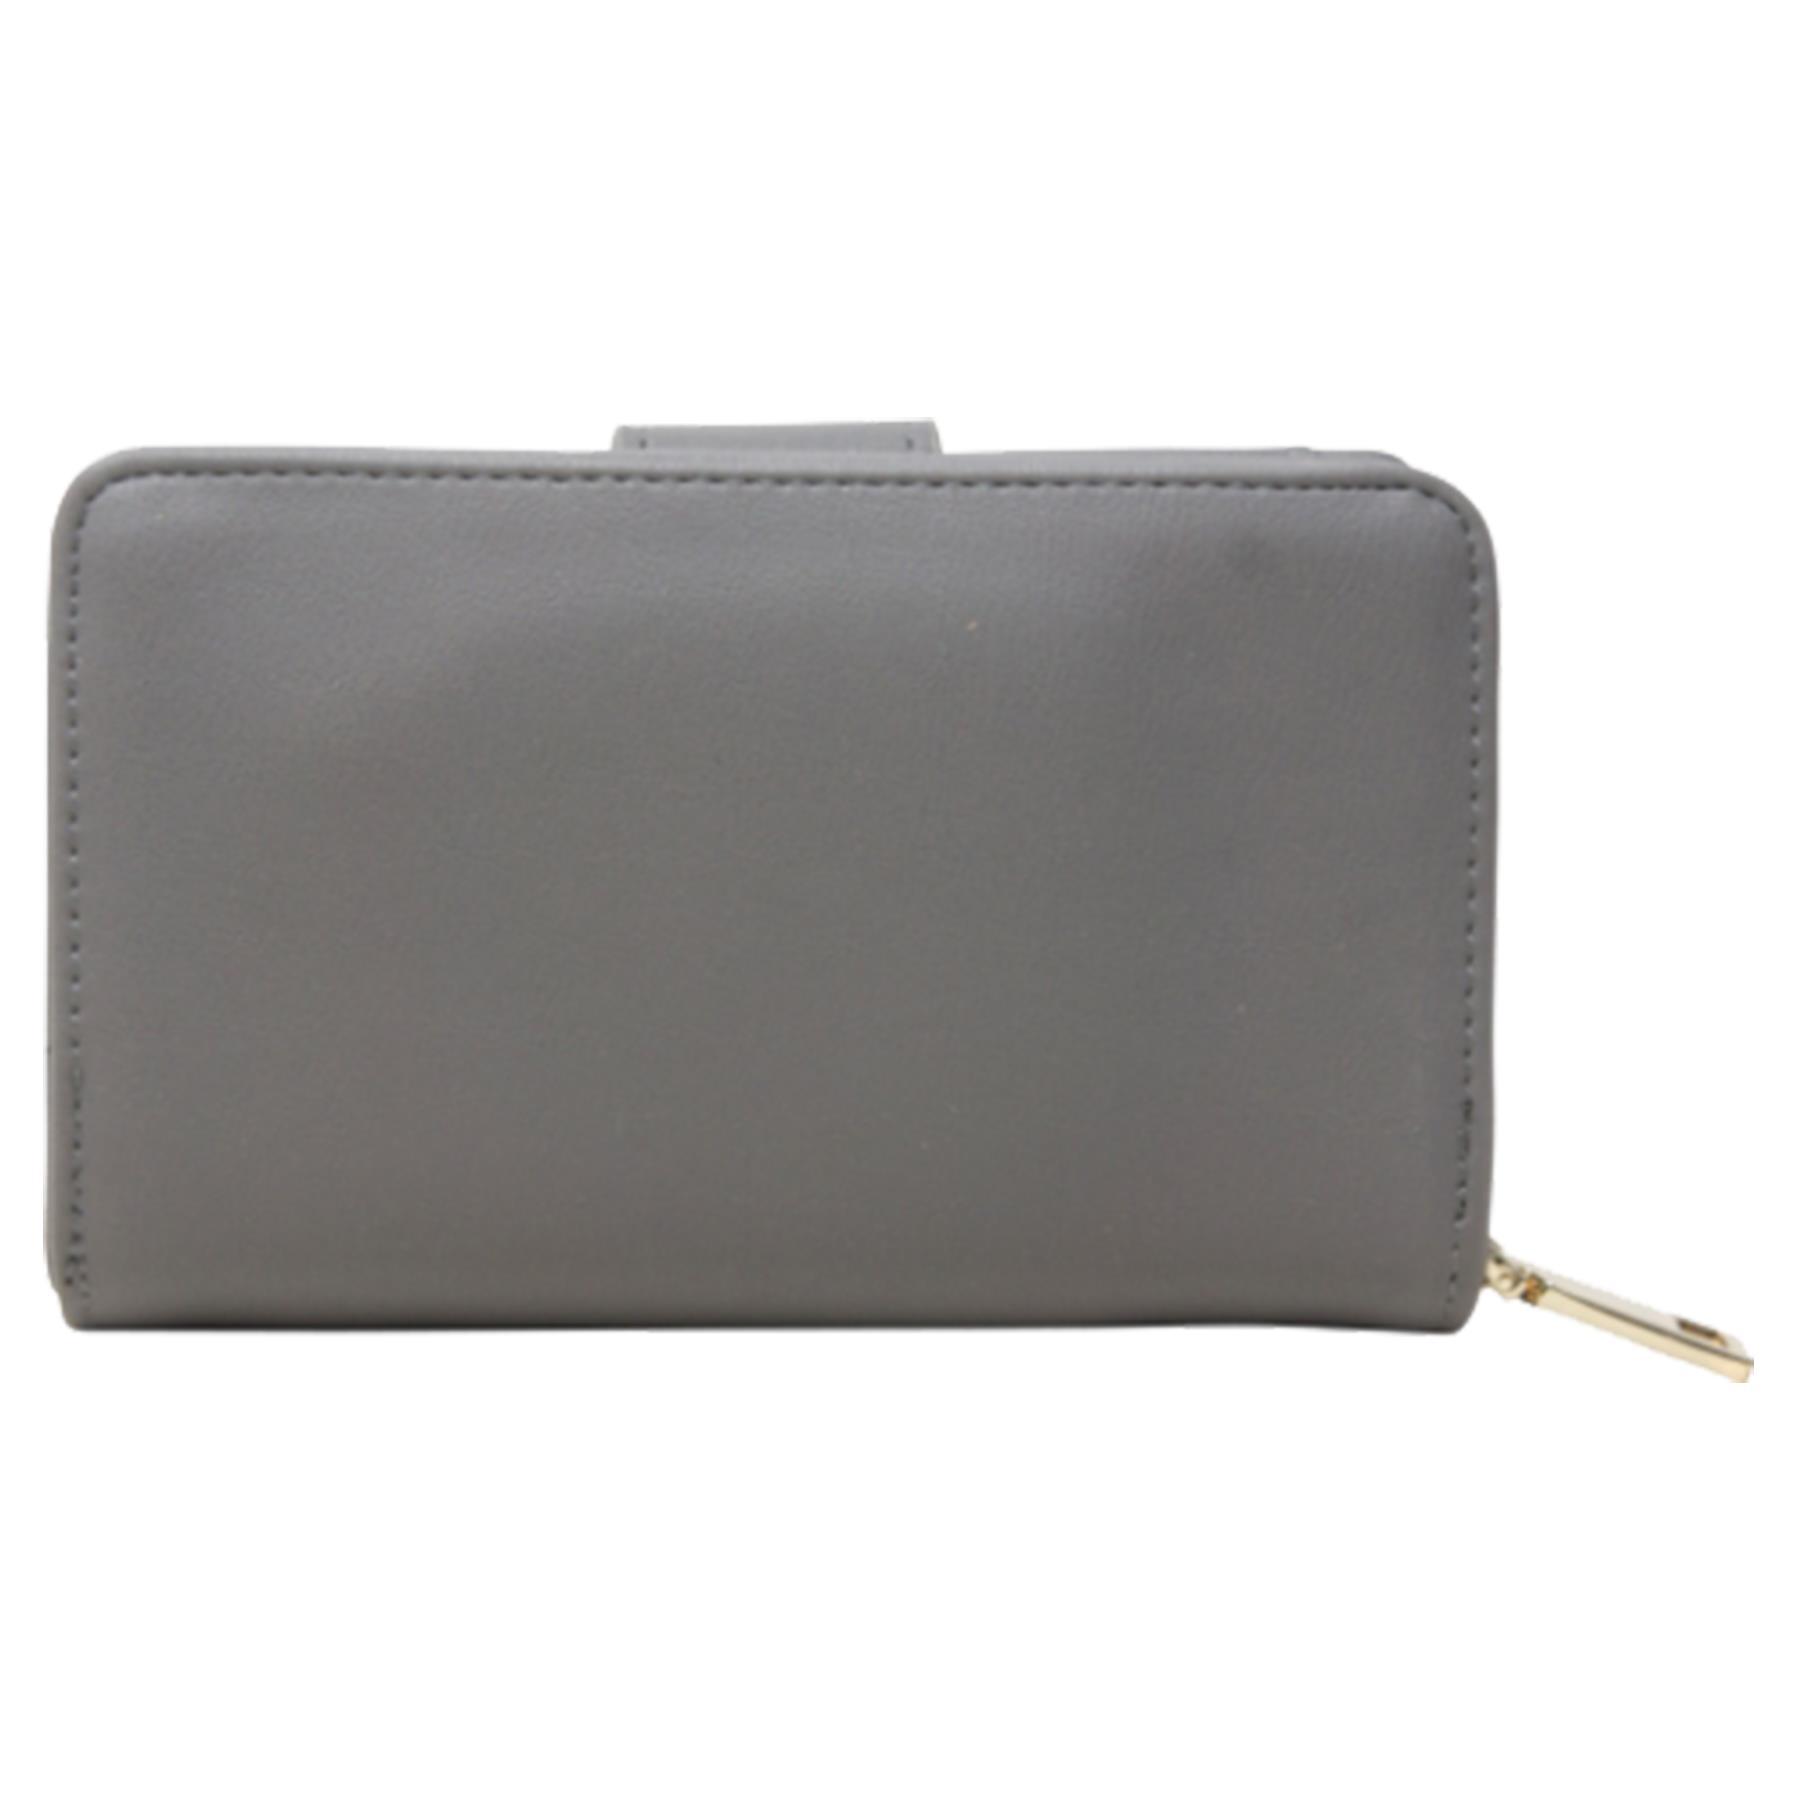 New-Ladies-Card-Slots-Zipped-Pocket-Faux-Leather-Basic-Wallet-Purse thumbnail 15